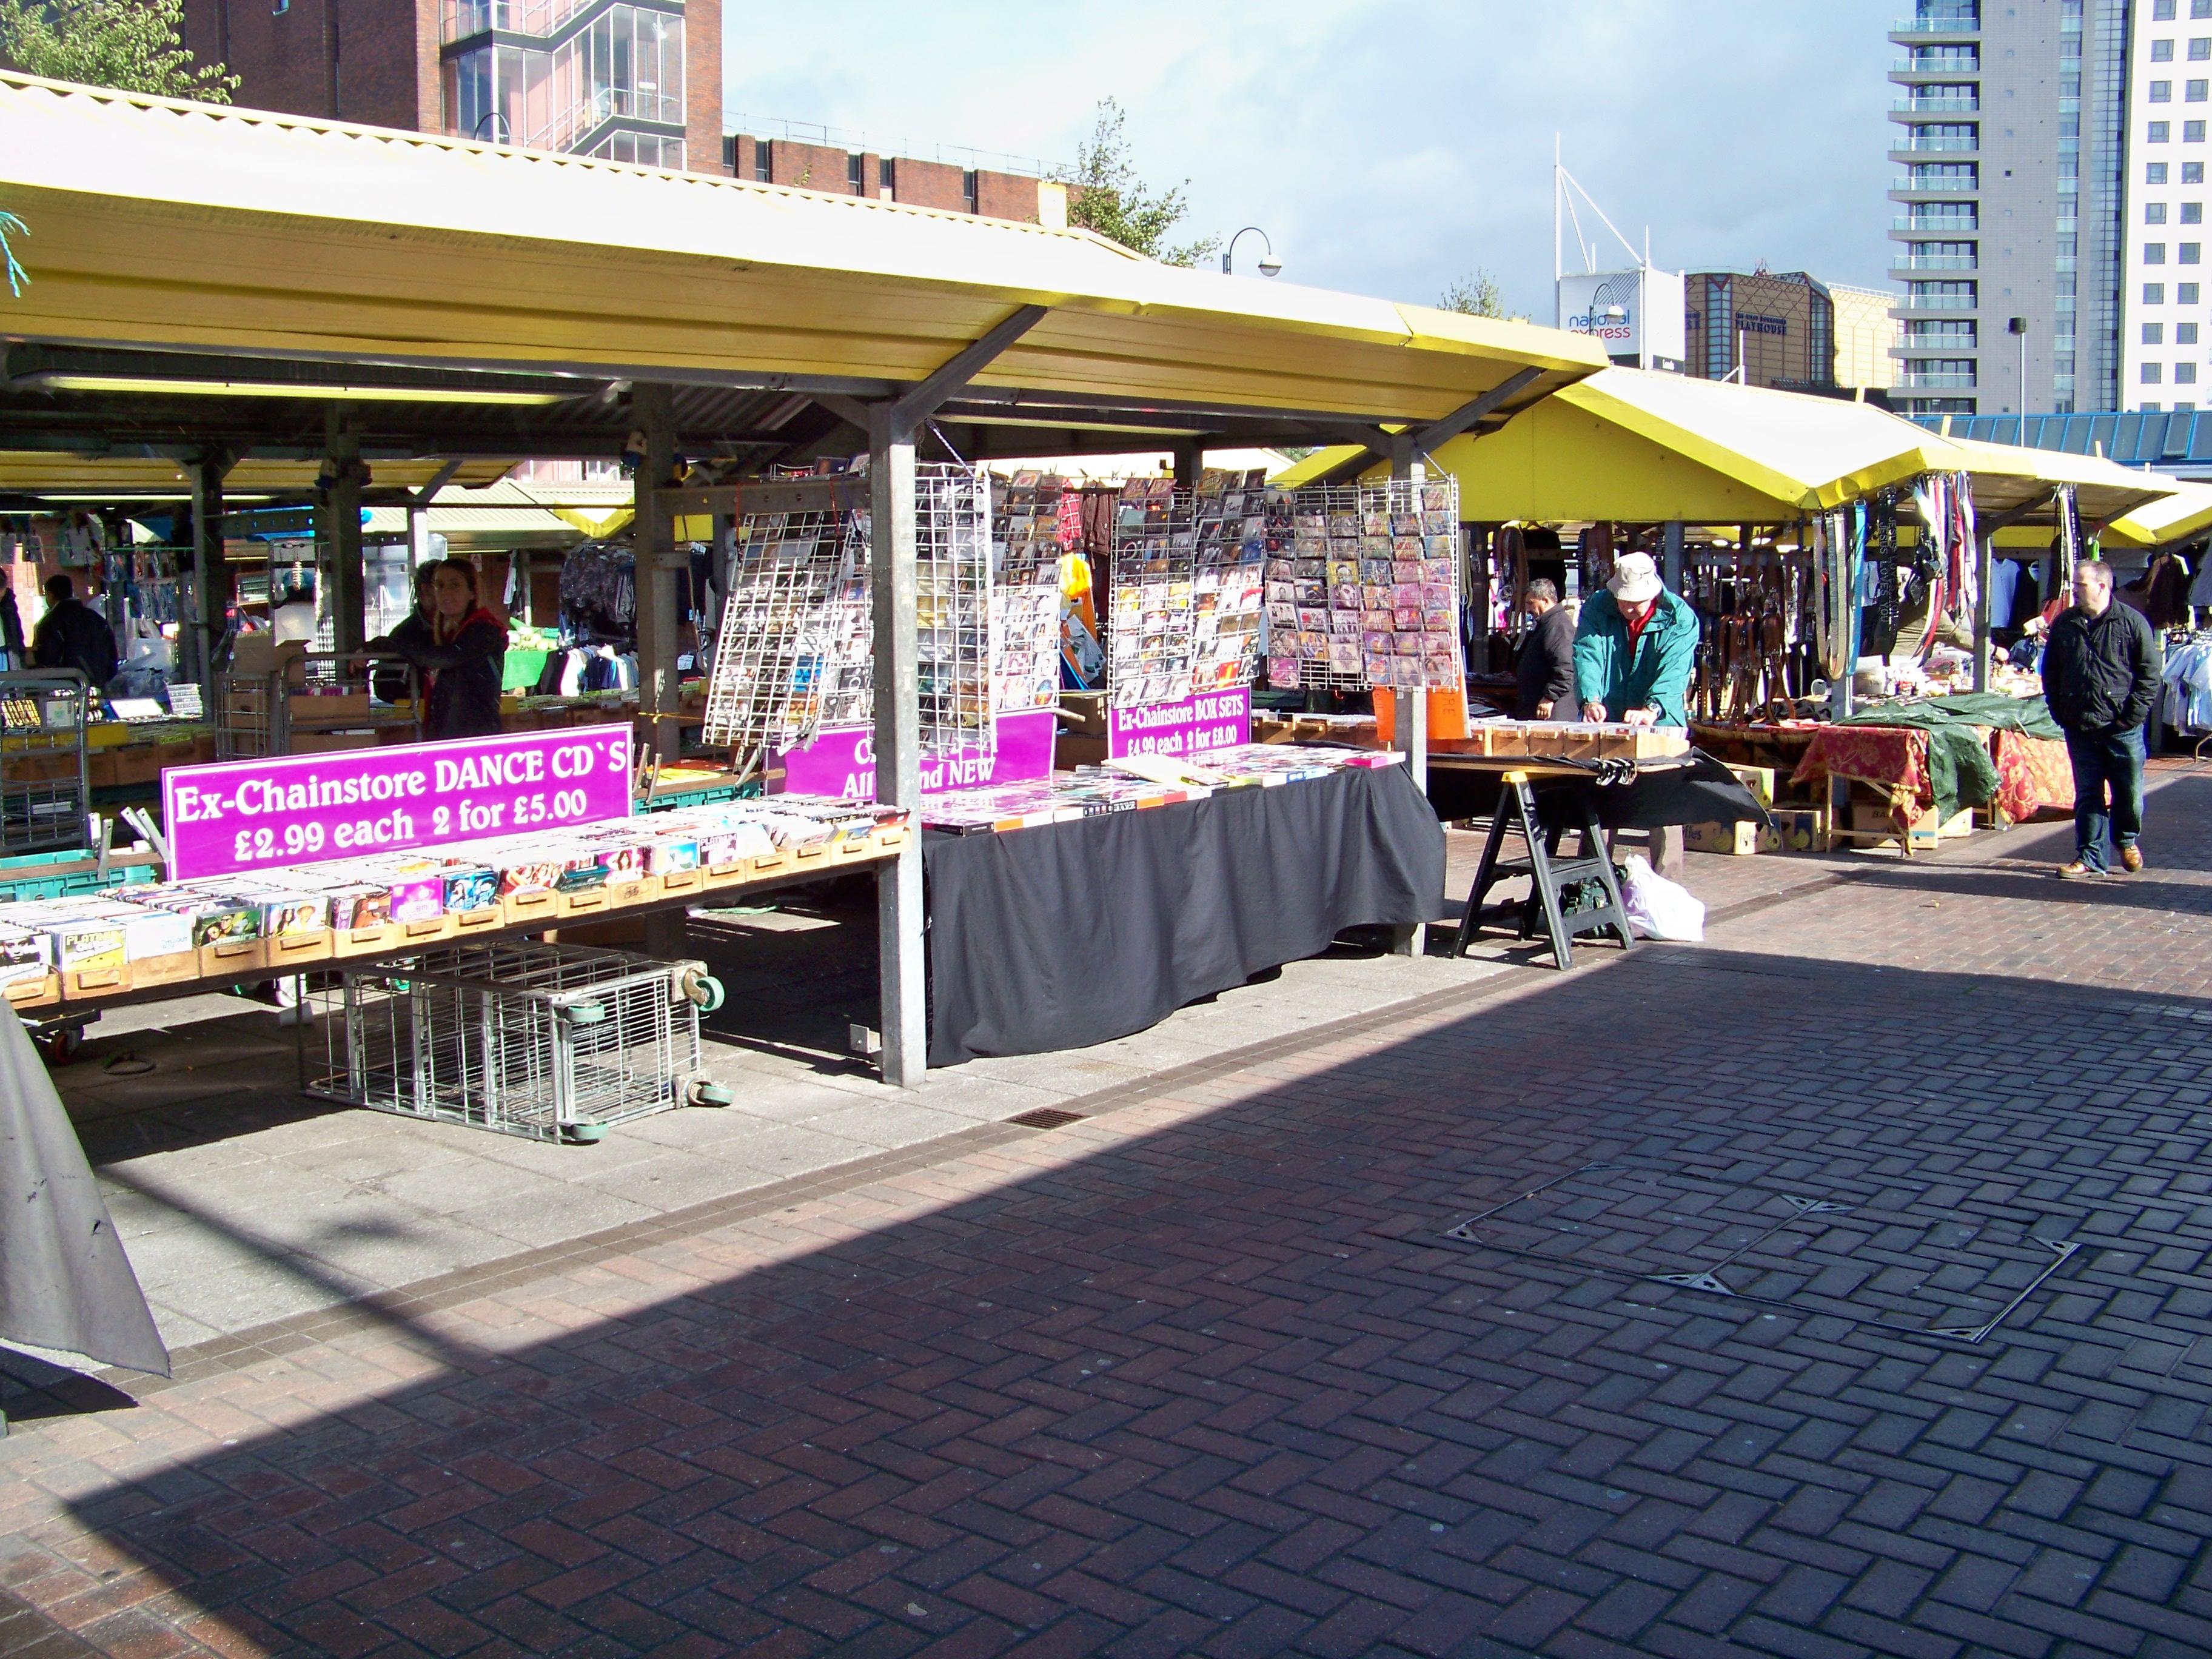 File:Outdoor market, Kirkgate Market, Leeds 001.jpg ...